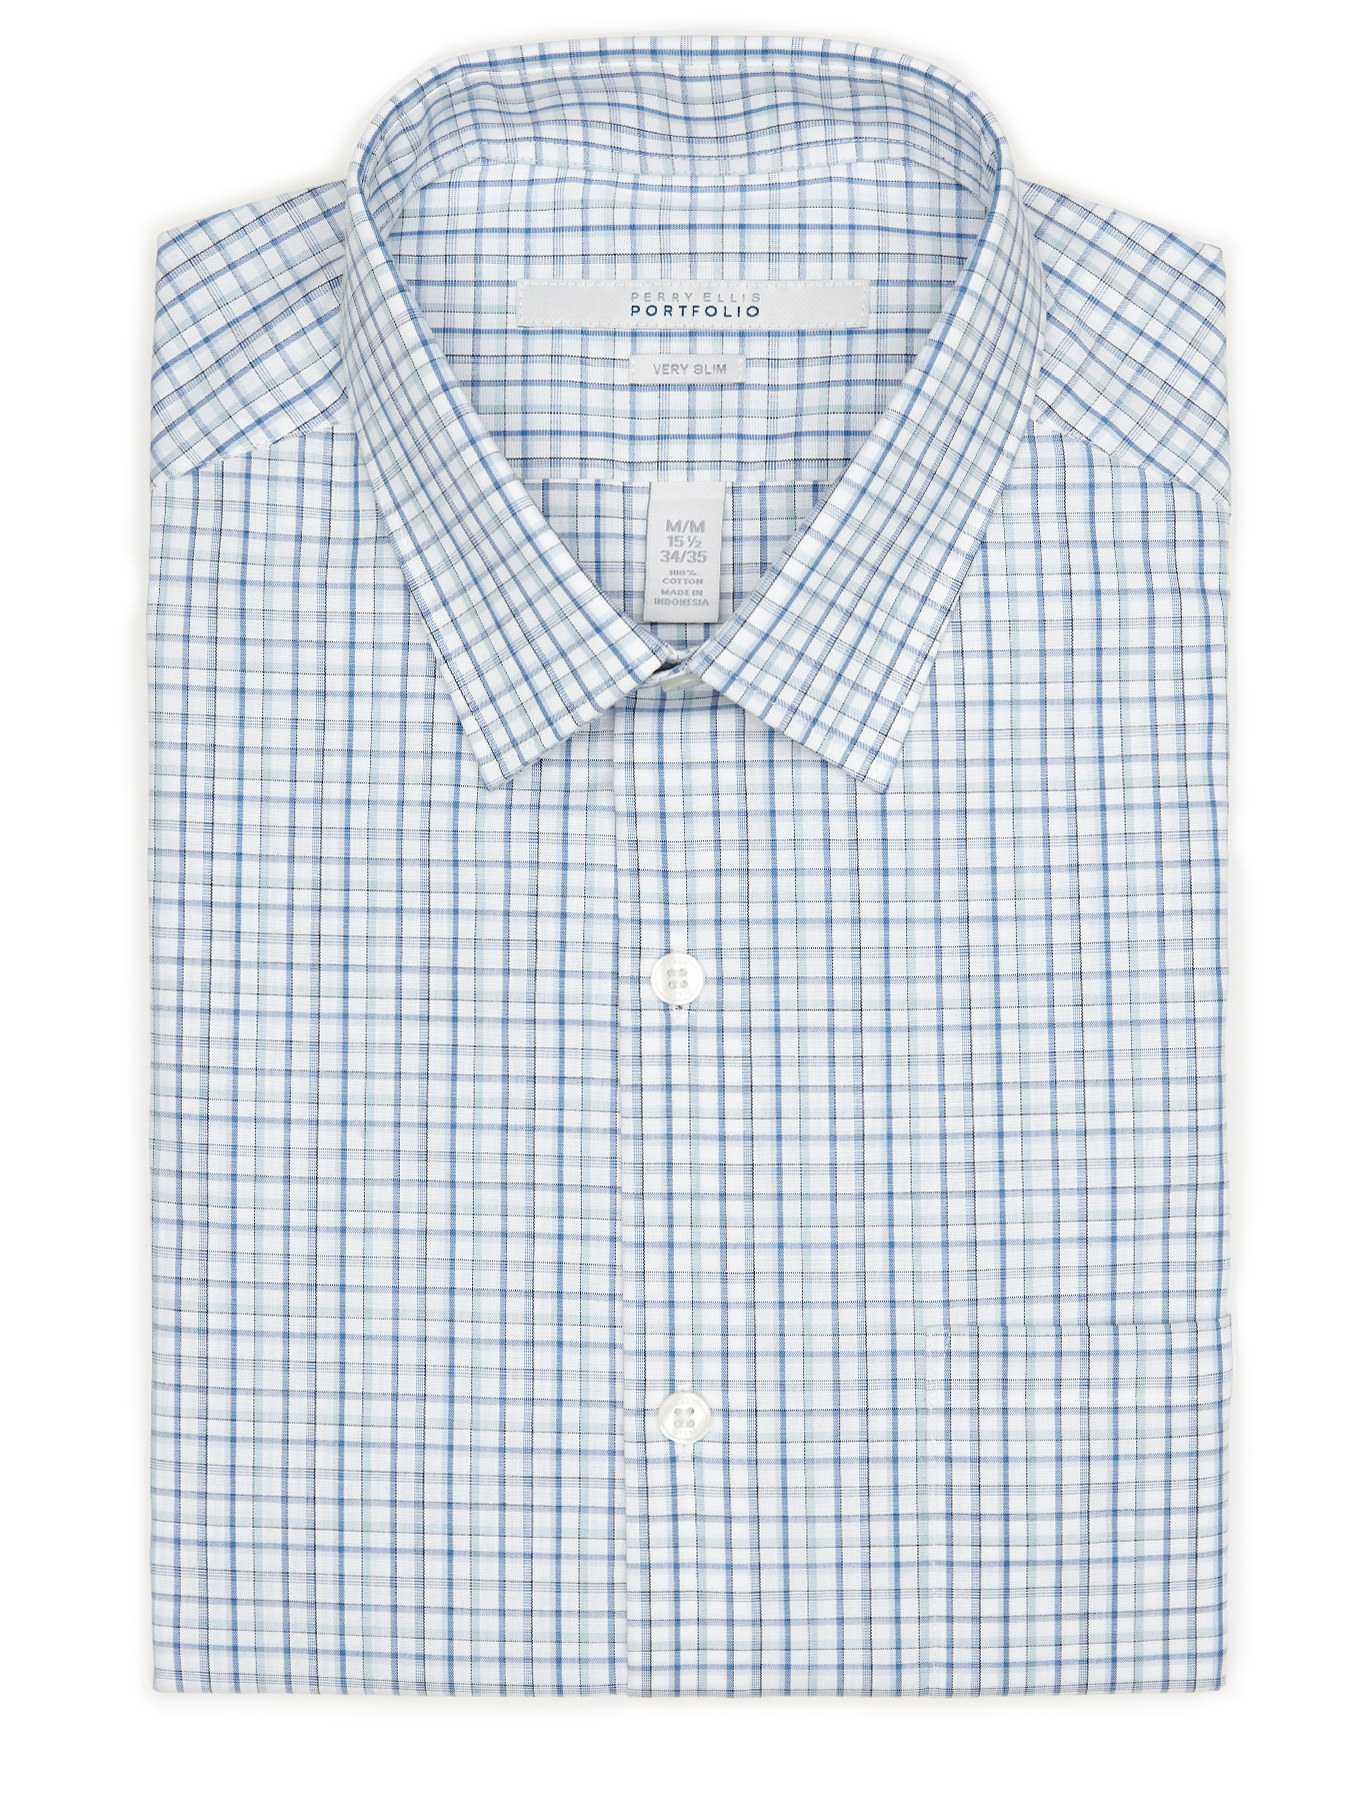 Perry Ellis Very Slim Windowpane Dress Shirt